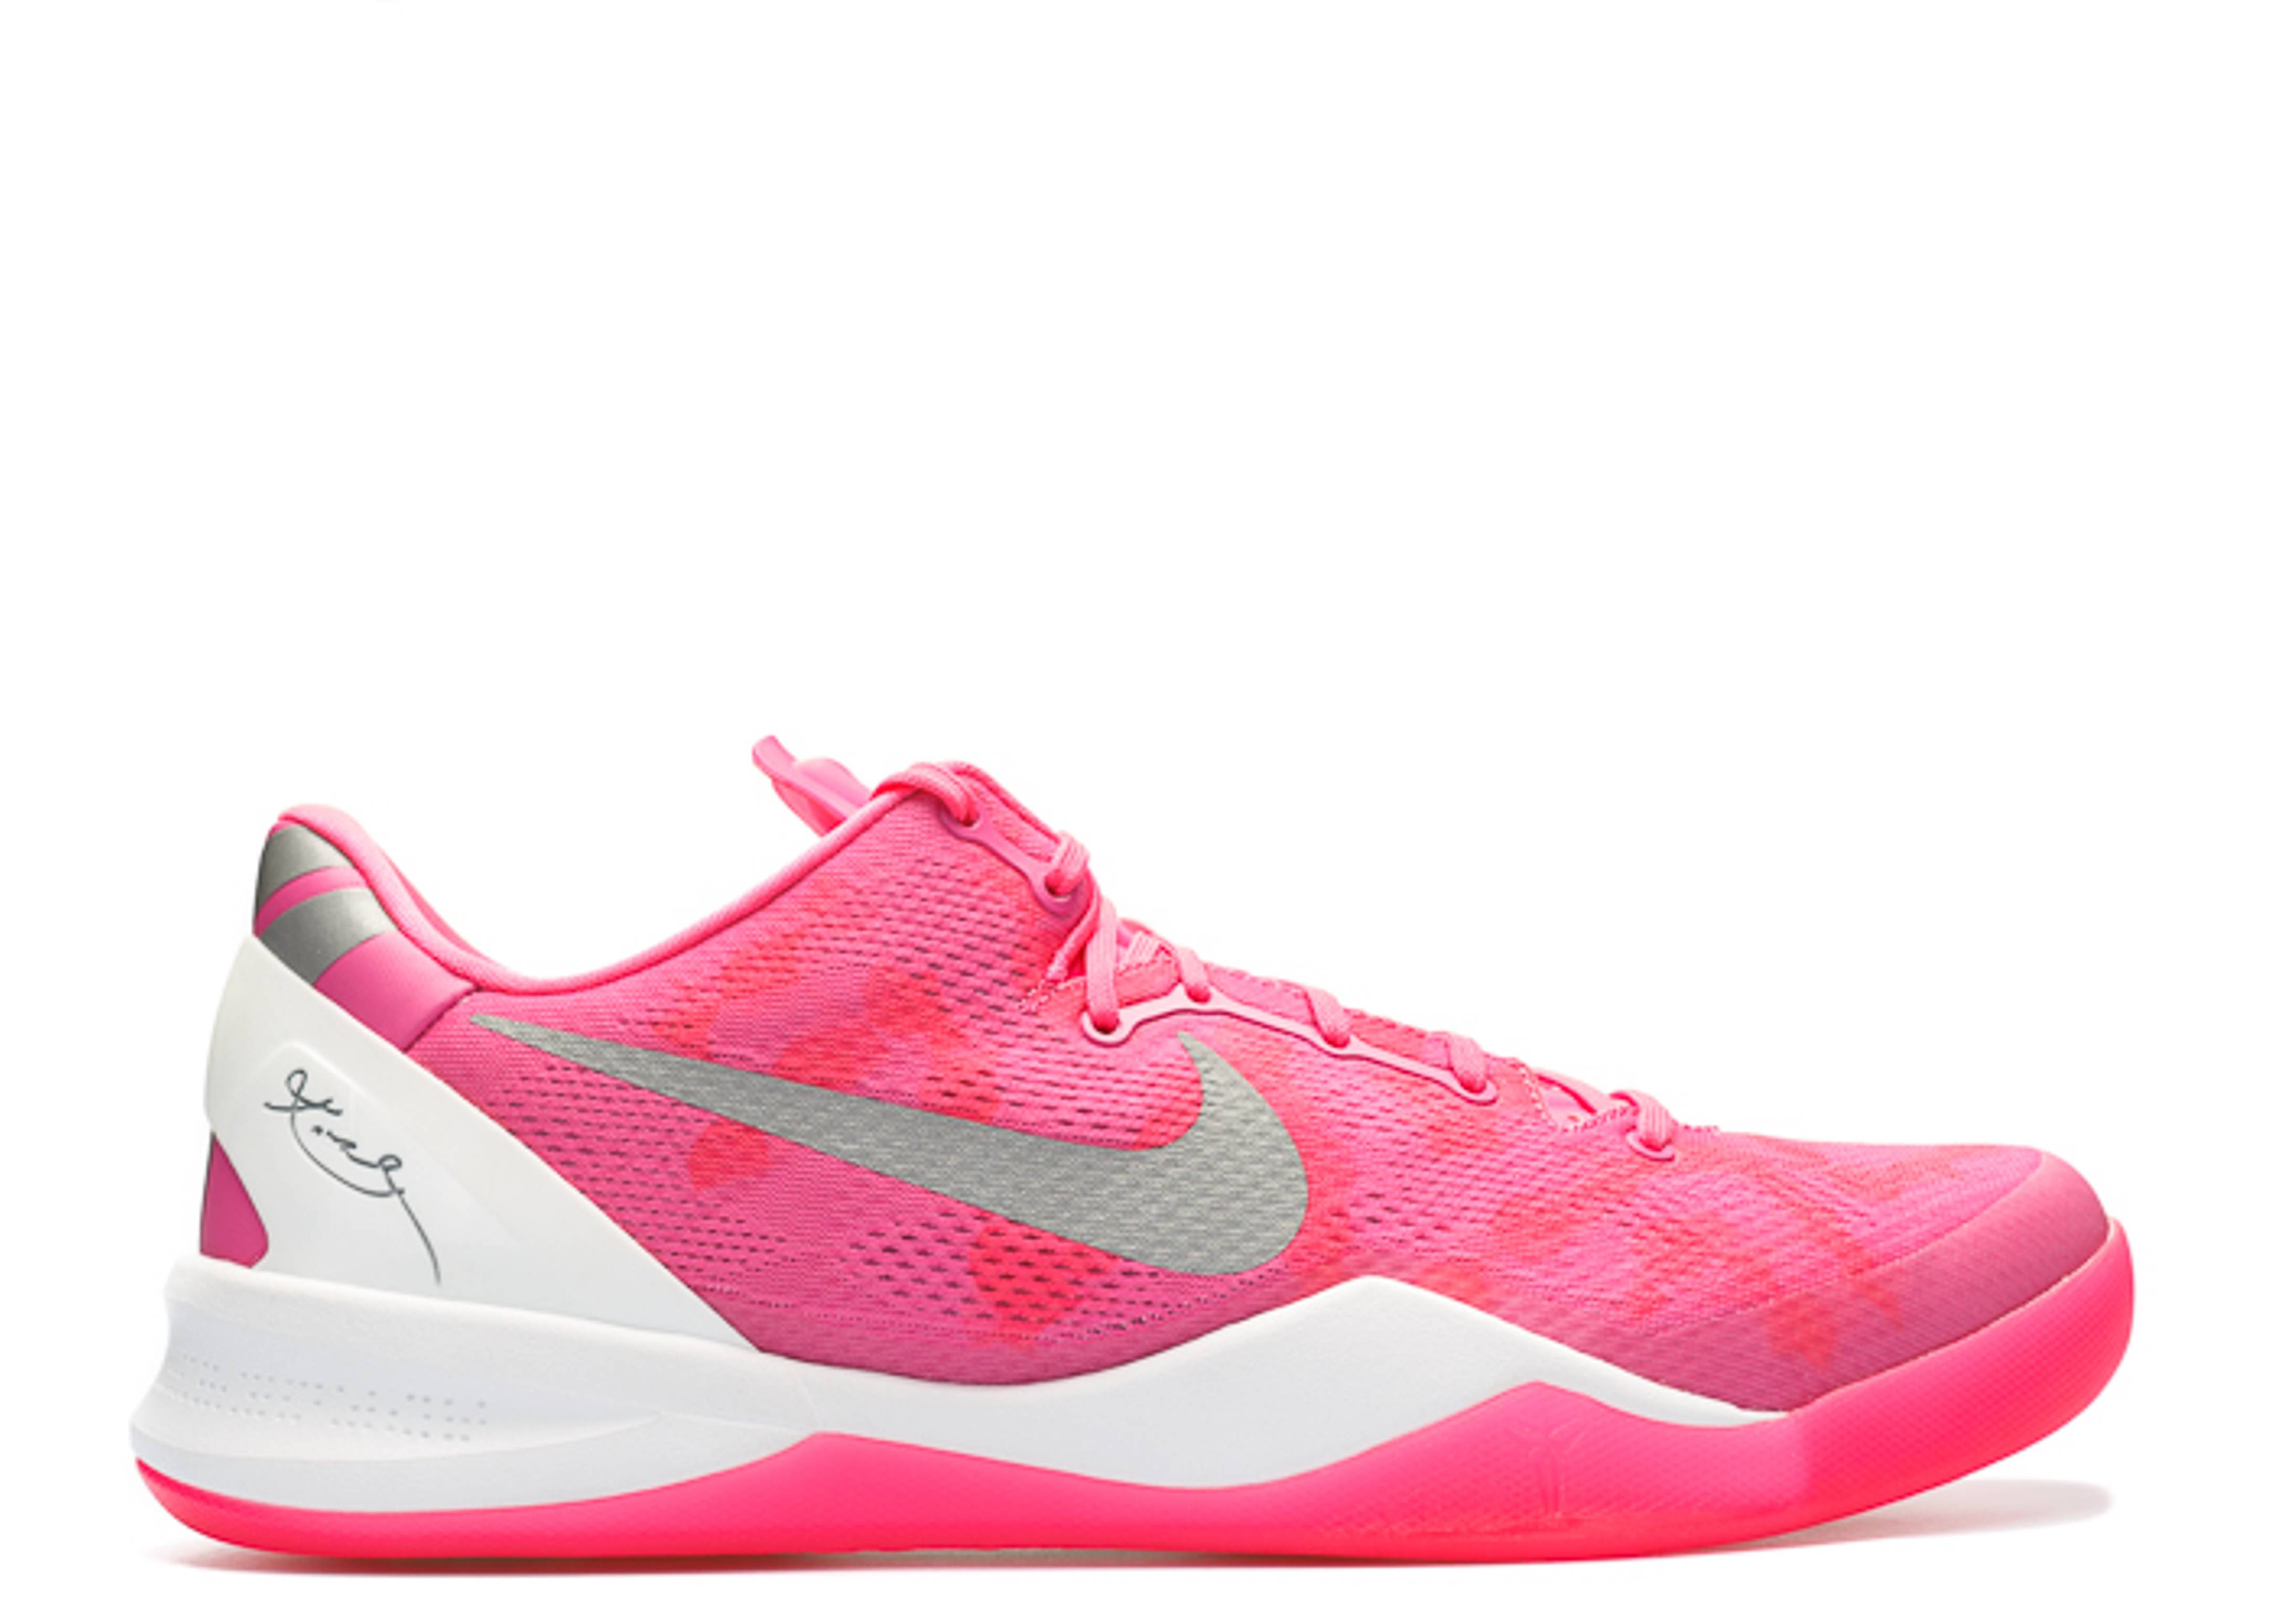 best sneakers 68e00 8ce2a Kobe 8 System